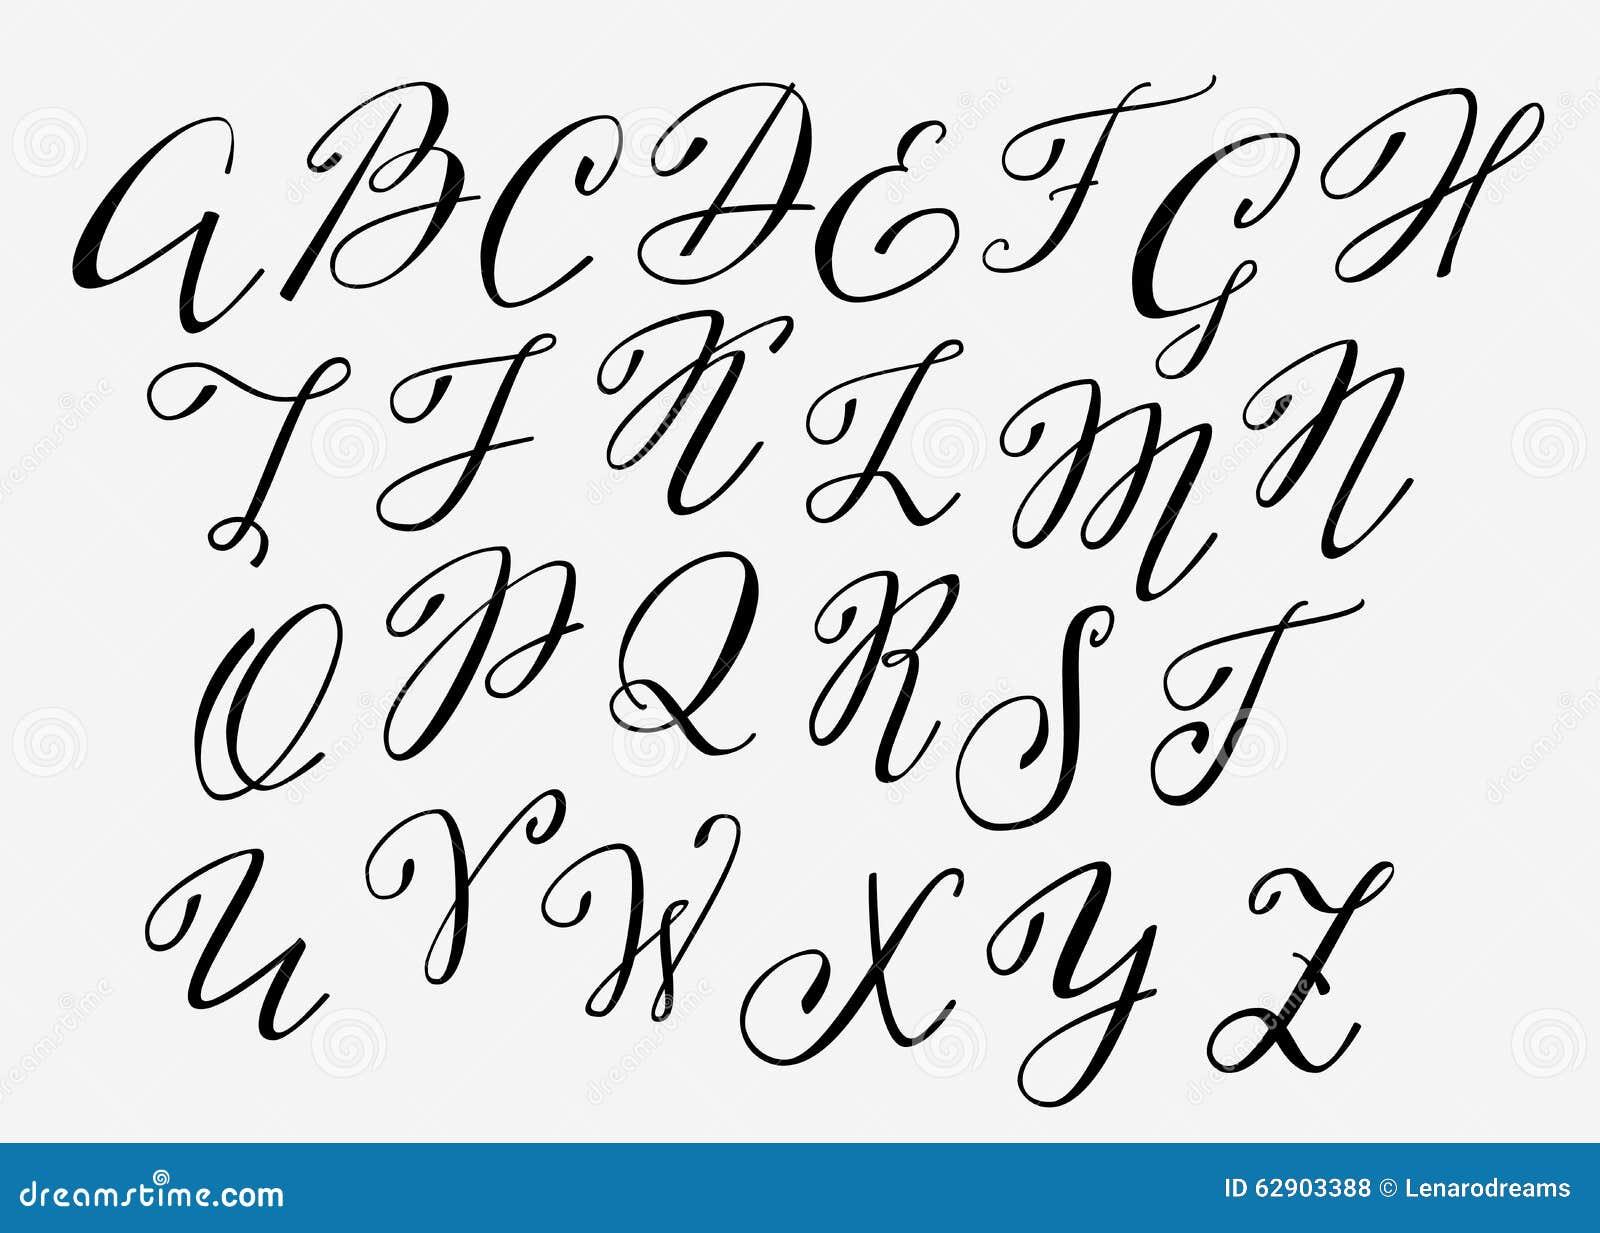 Handwritten Calligraphy Flourish Font Stock Illustration - Image ...